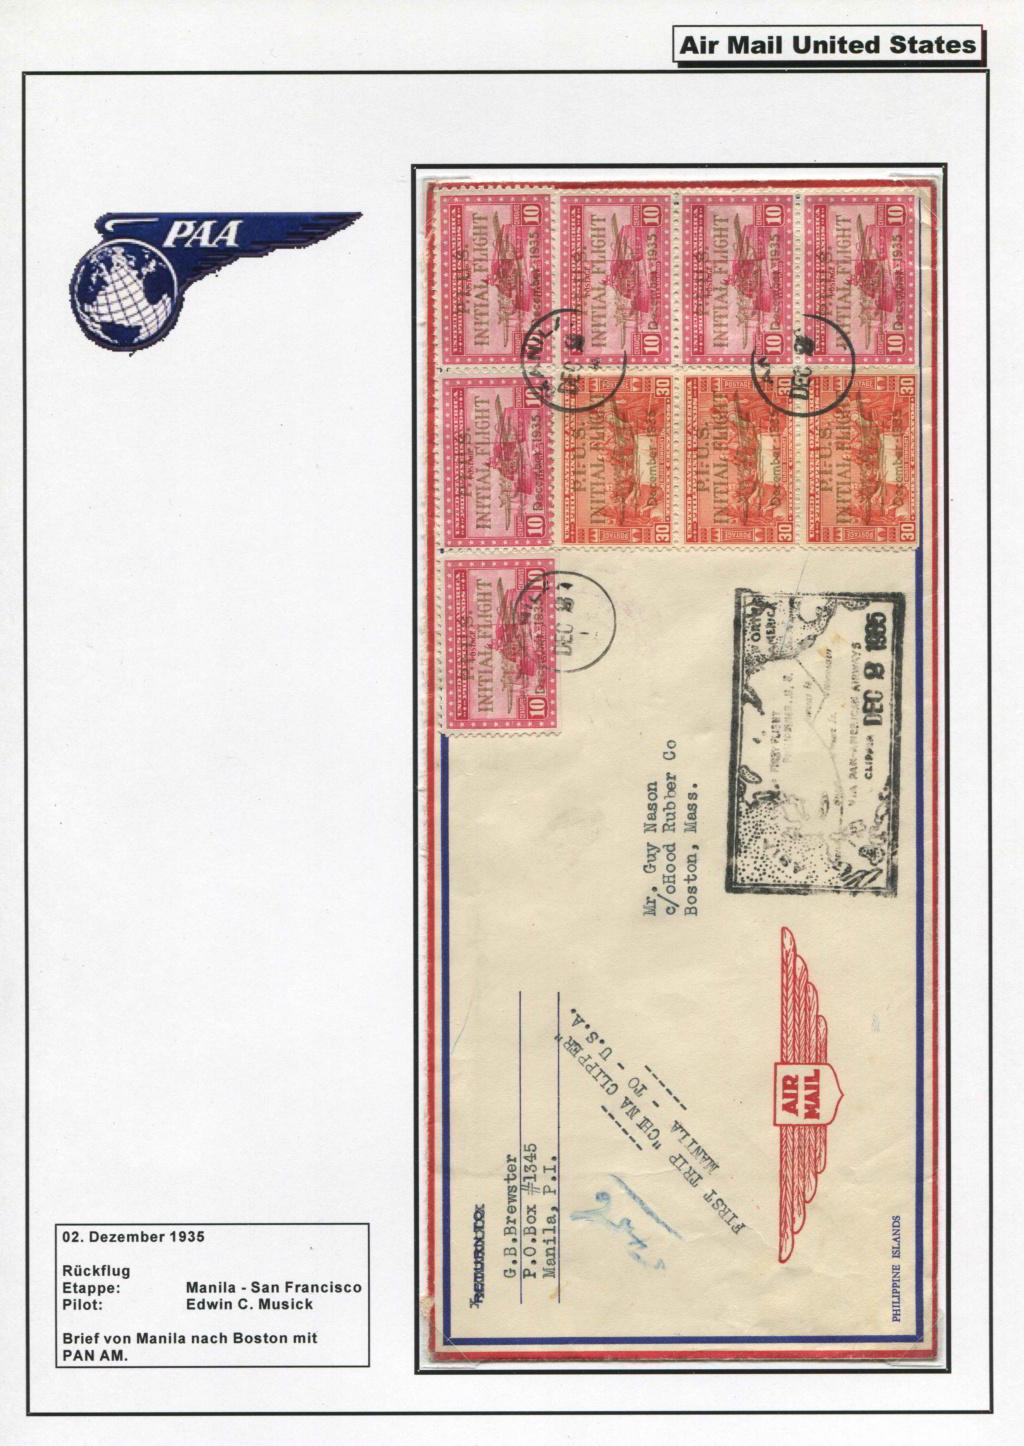 Sammlung FAM 14 (FOREIGN AIR MAIL ROUTE No 14) - Teil 1 Fam_1428